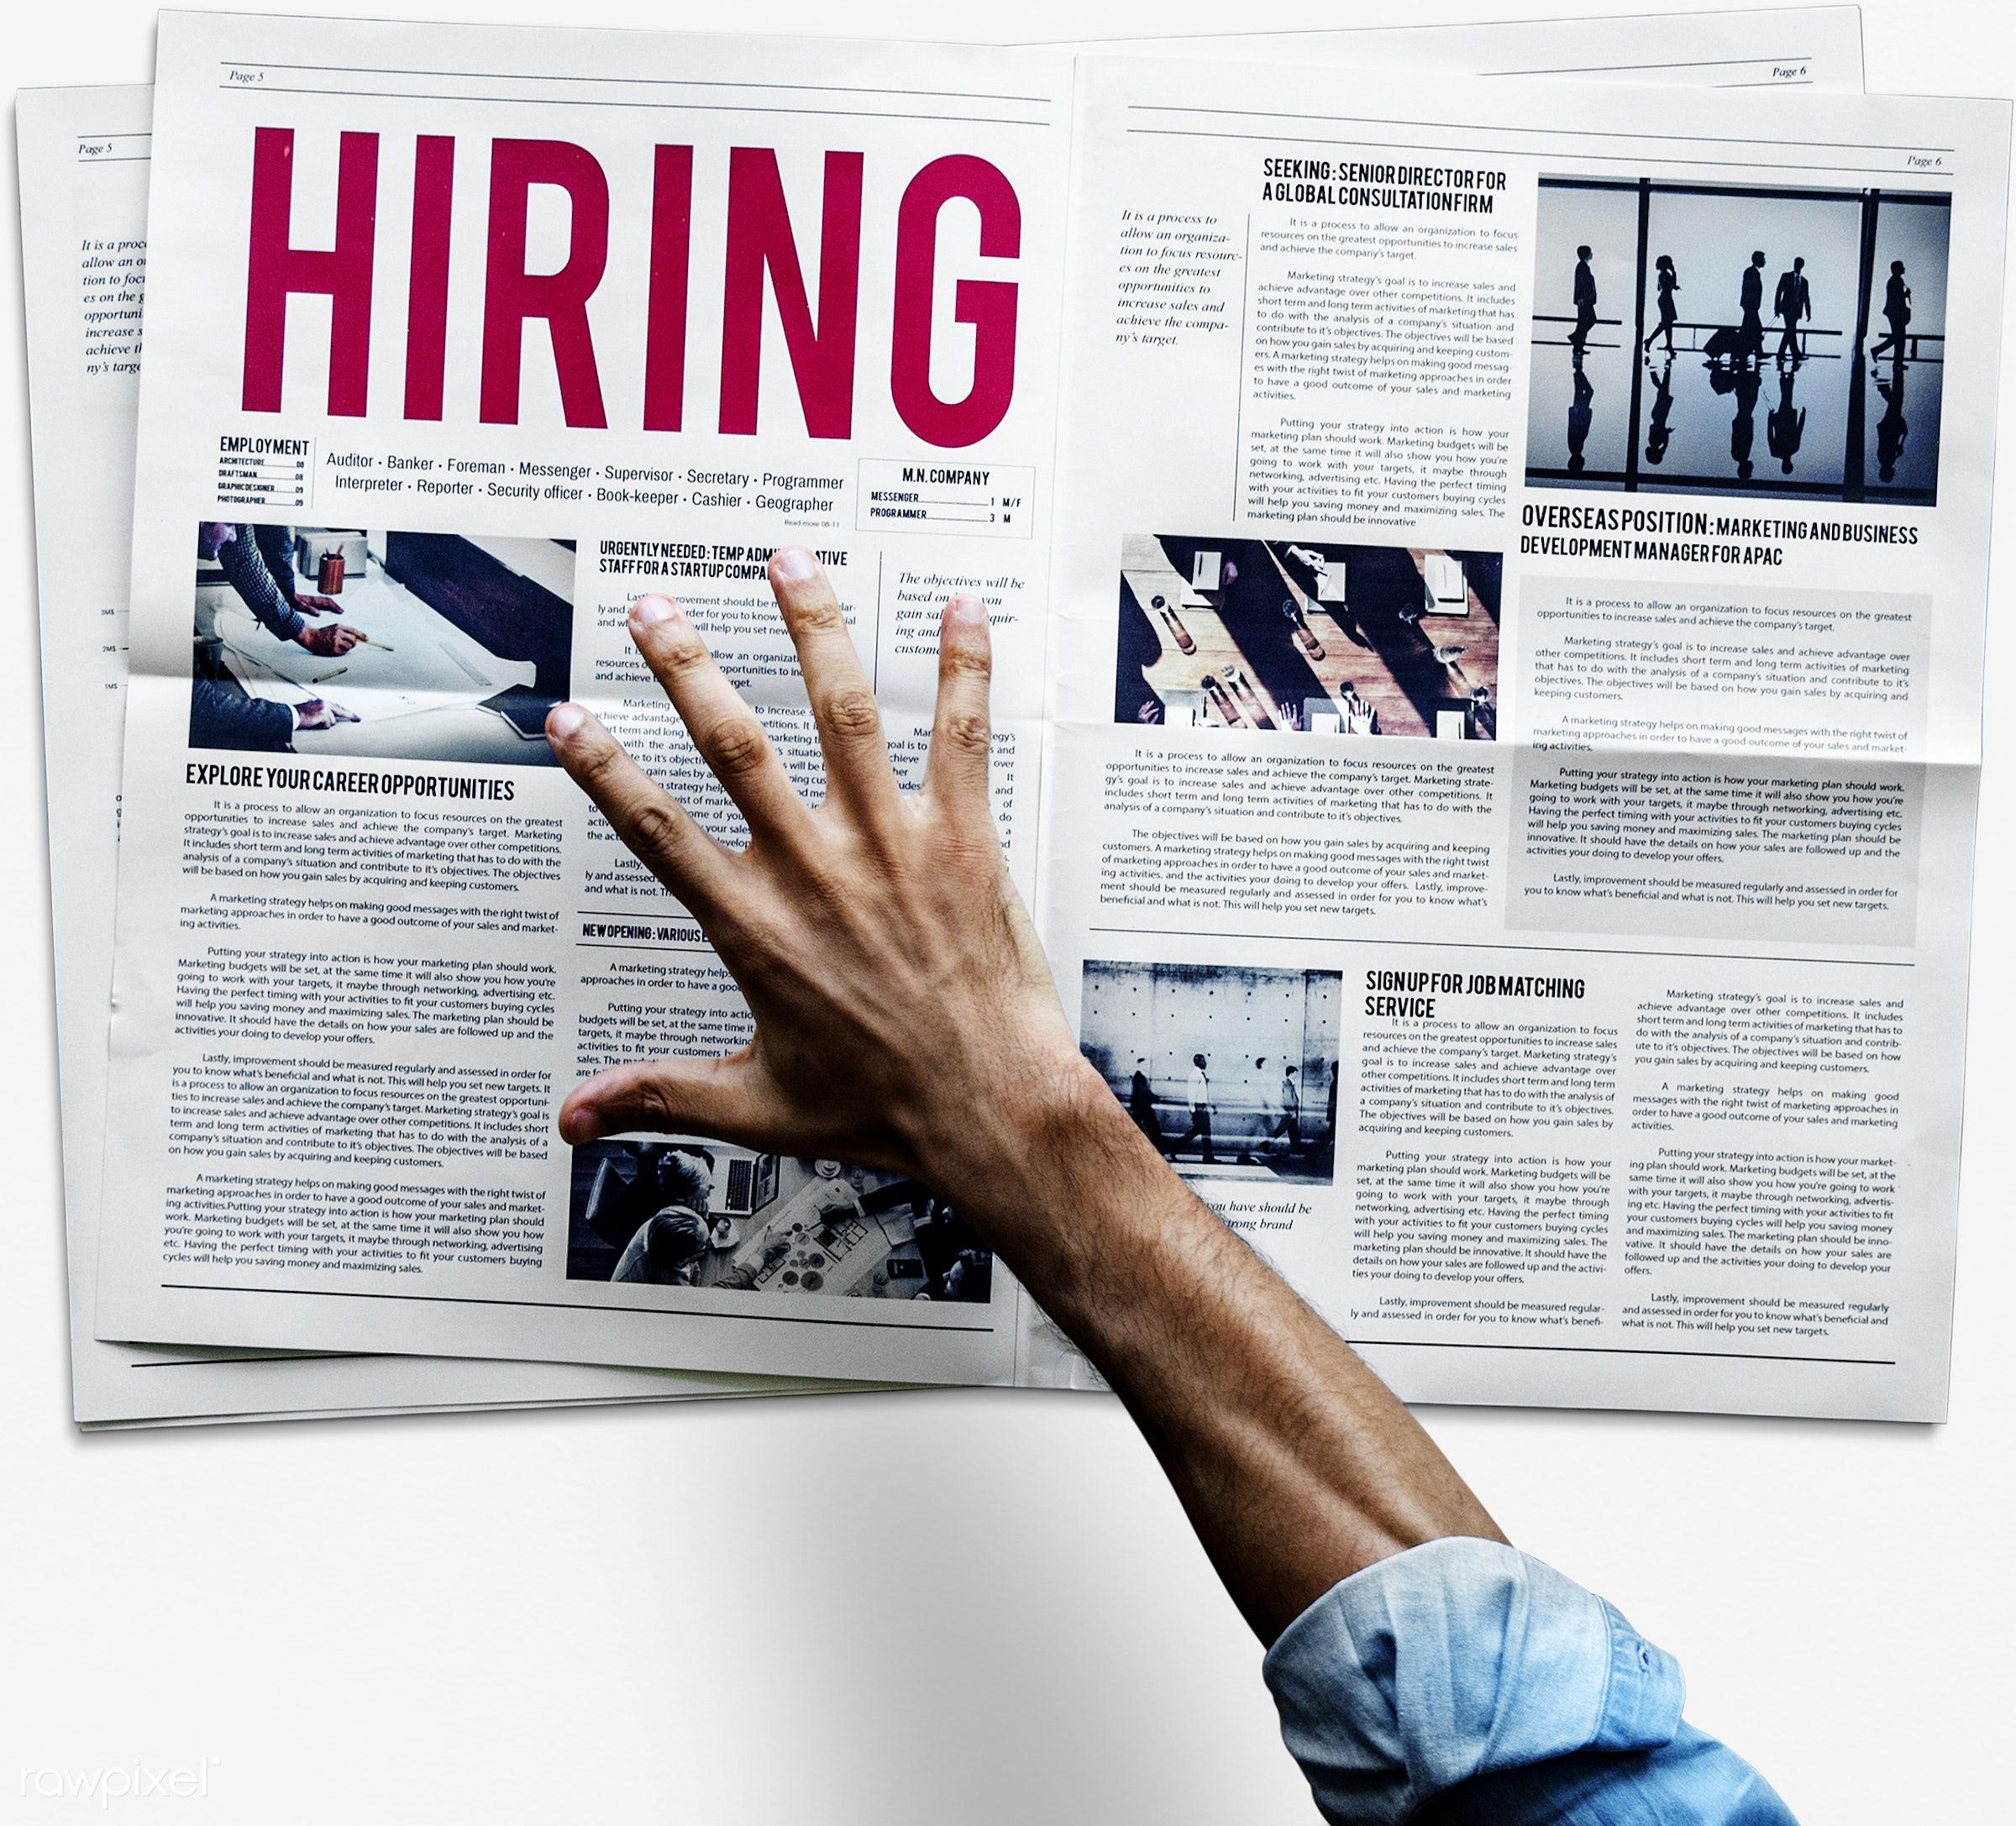 recruiting, recruitment, ability, announcement, career, employment, find, hand, help, hire, hiring, human hand, information...